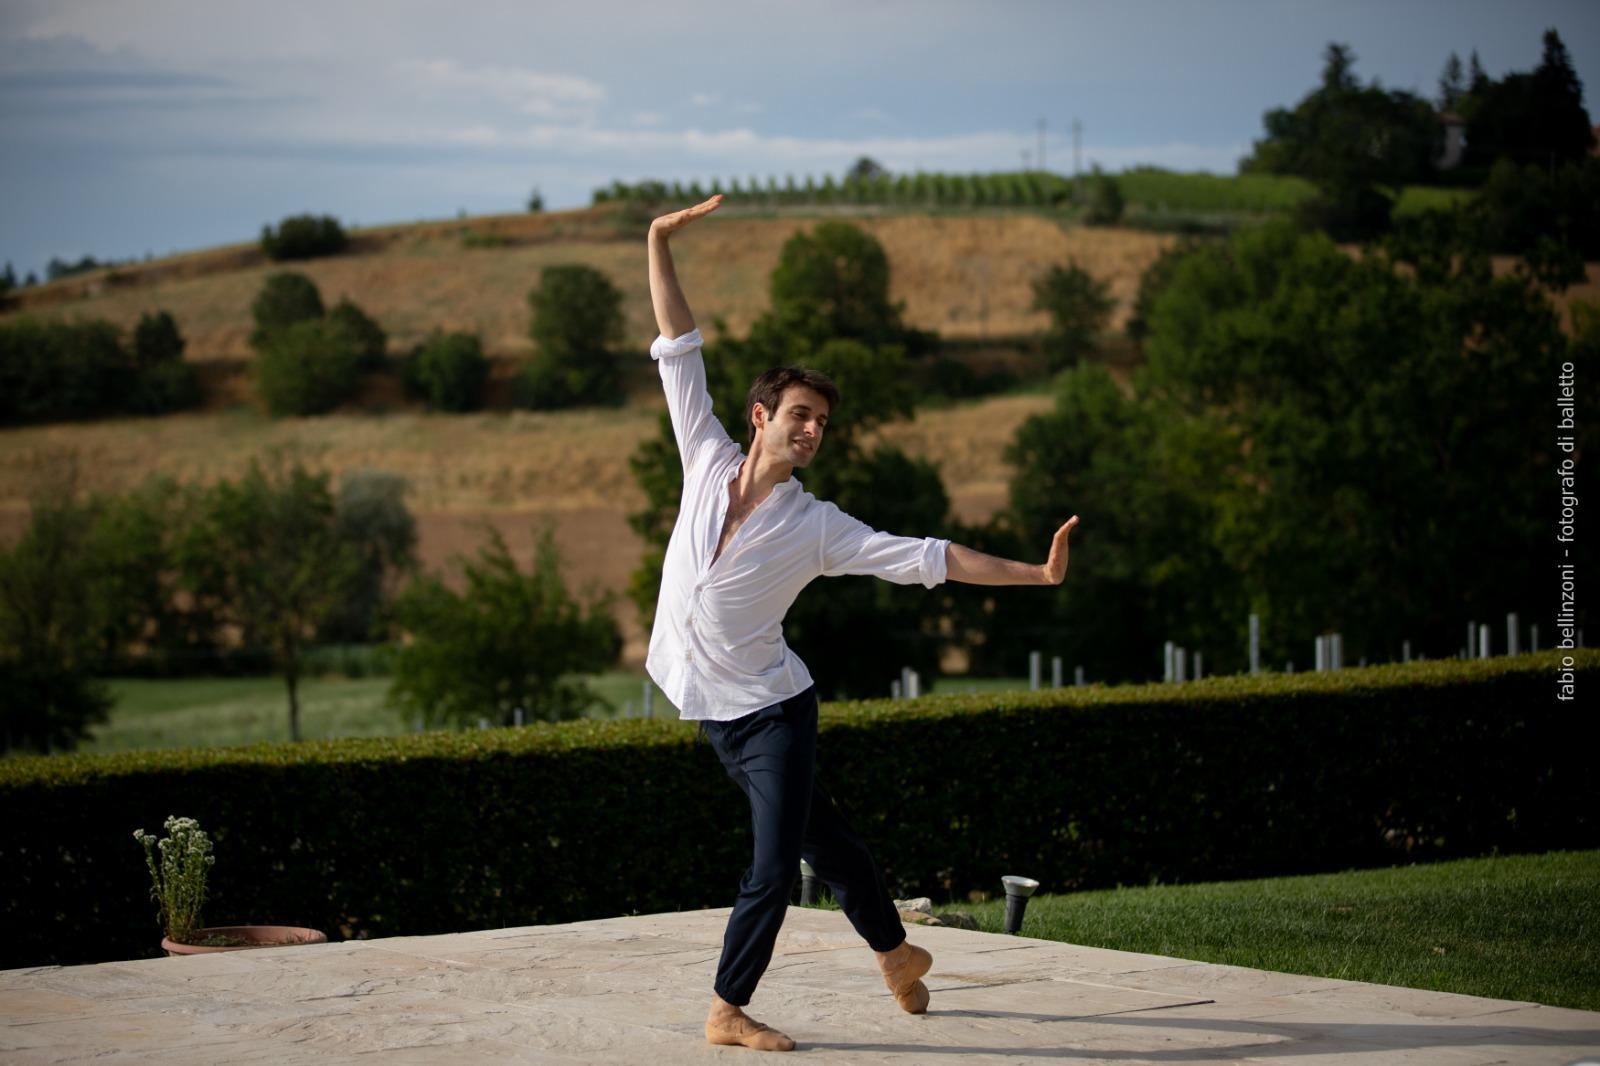 Marco Agostino